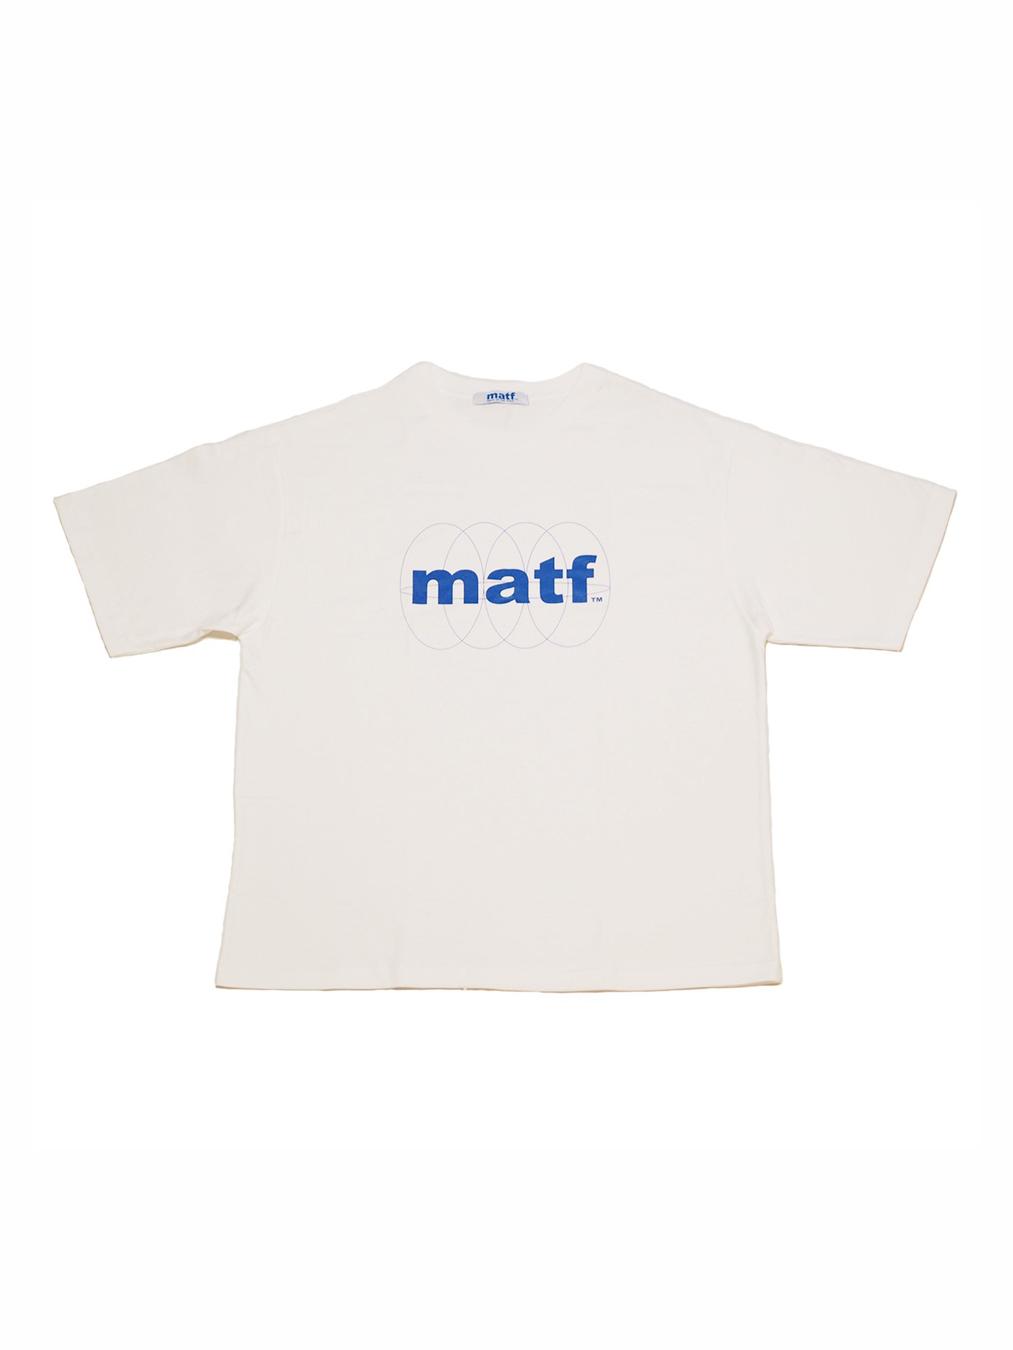 Matf Trademark *Logo* T-Shirt (White)